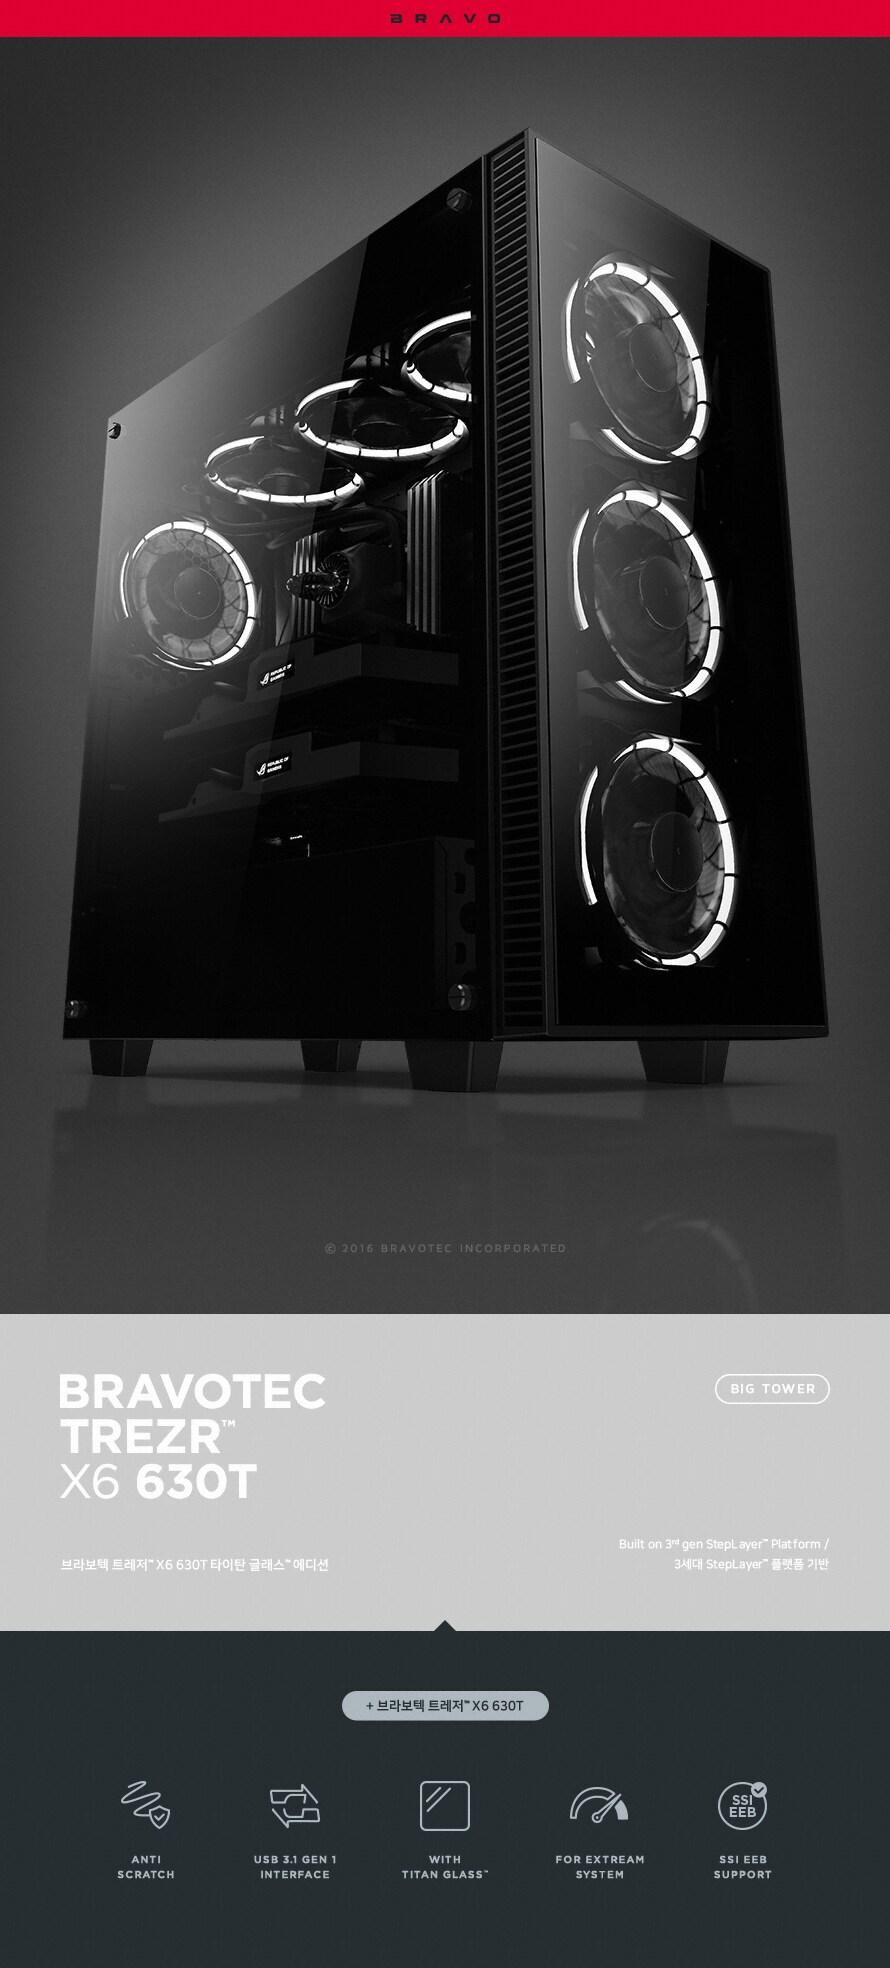 Edit160527_BRAVOTEC_TREZR_630T_DB_890_10.jpg